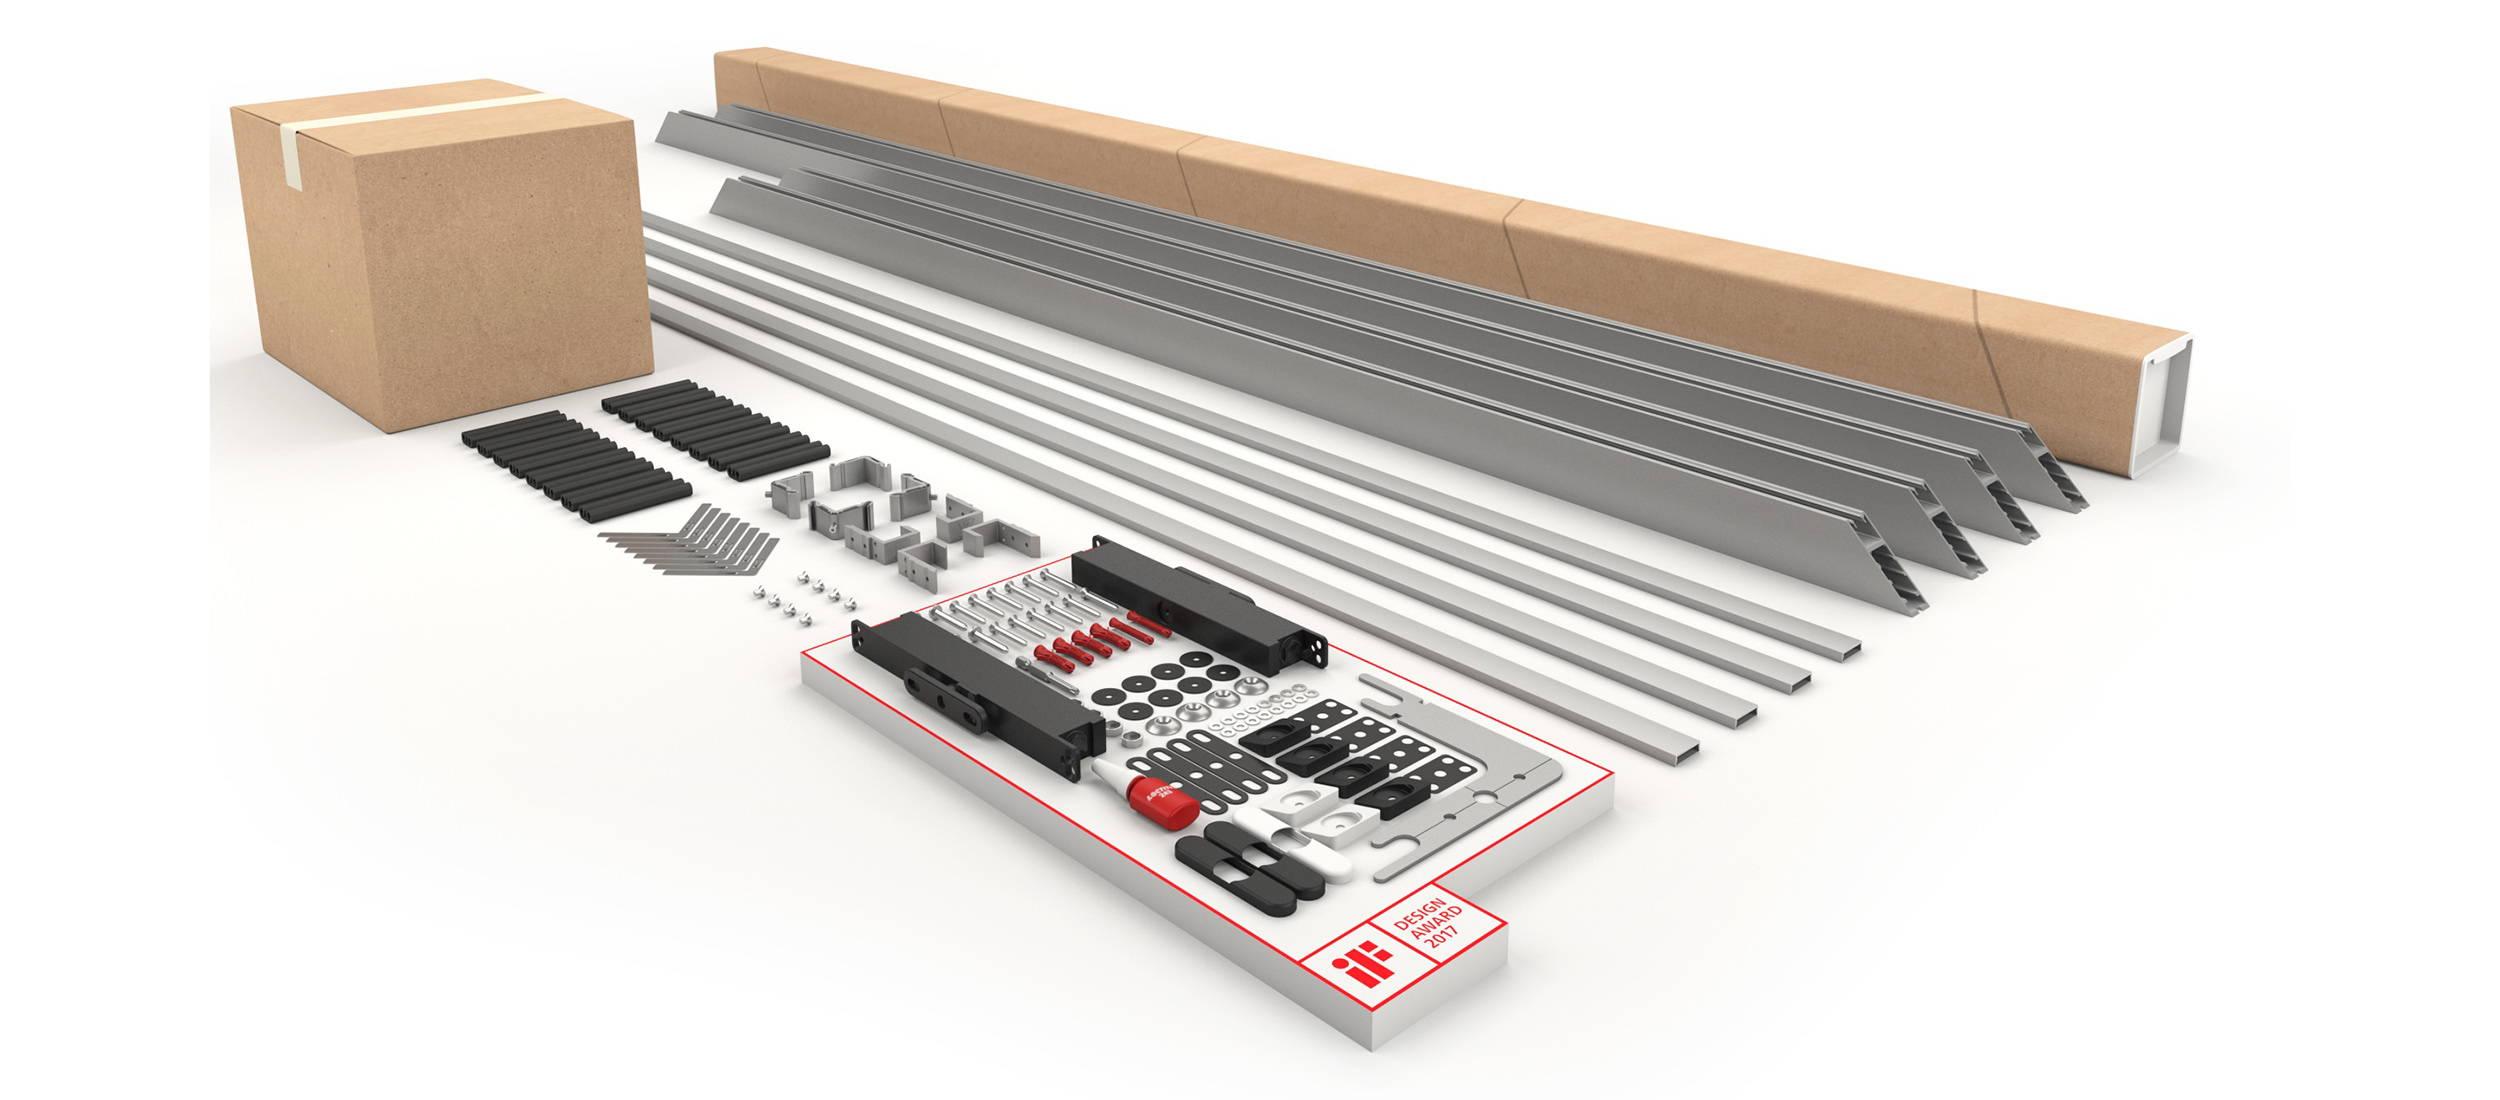 Portapivot 6530 self-assembly kit